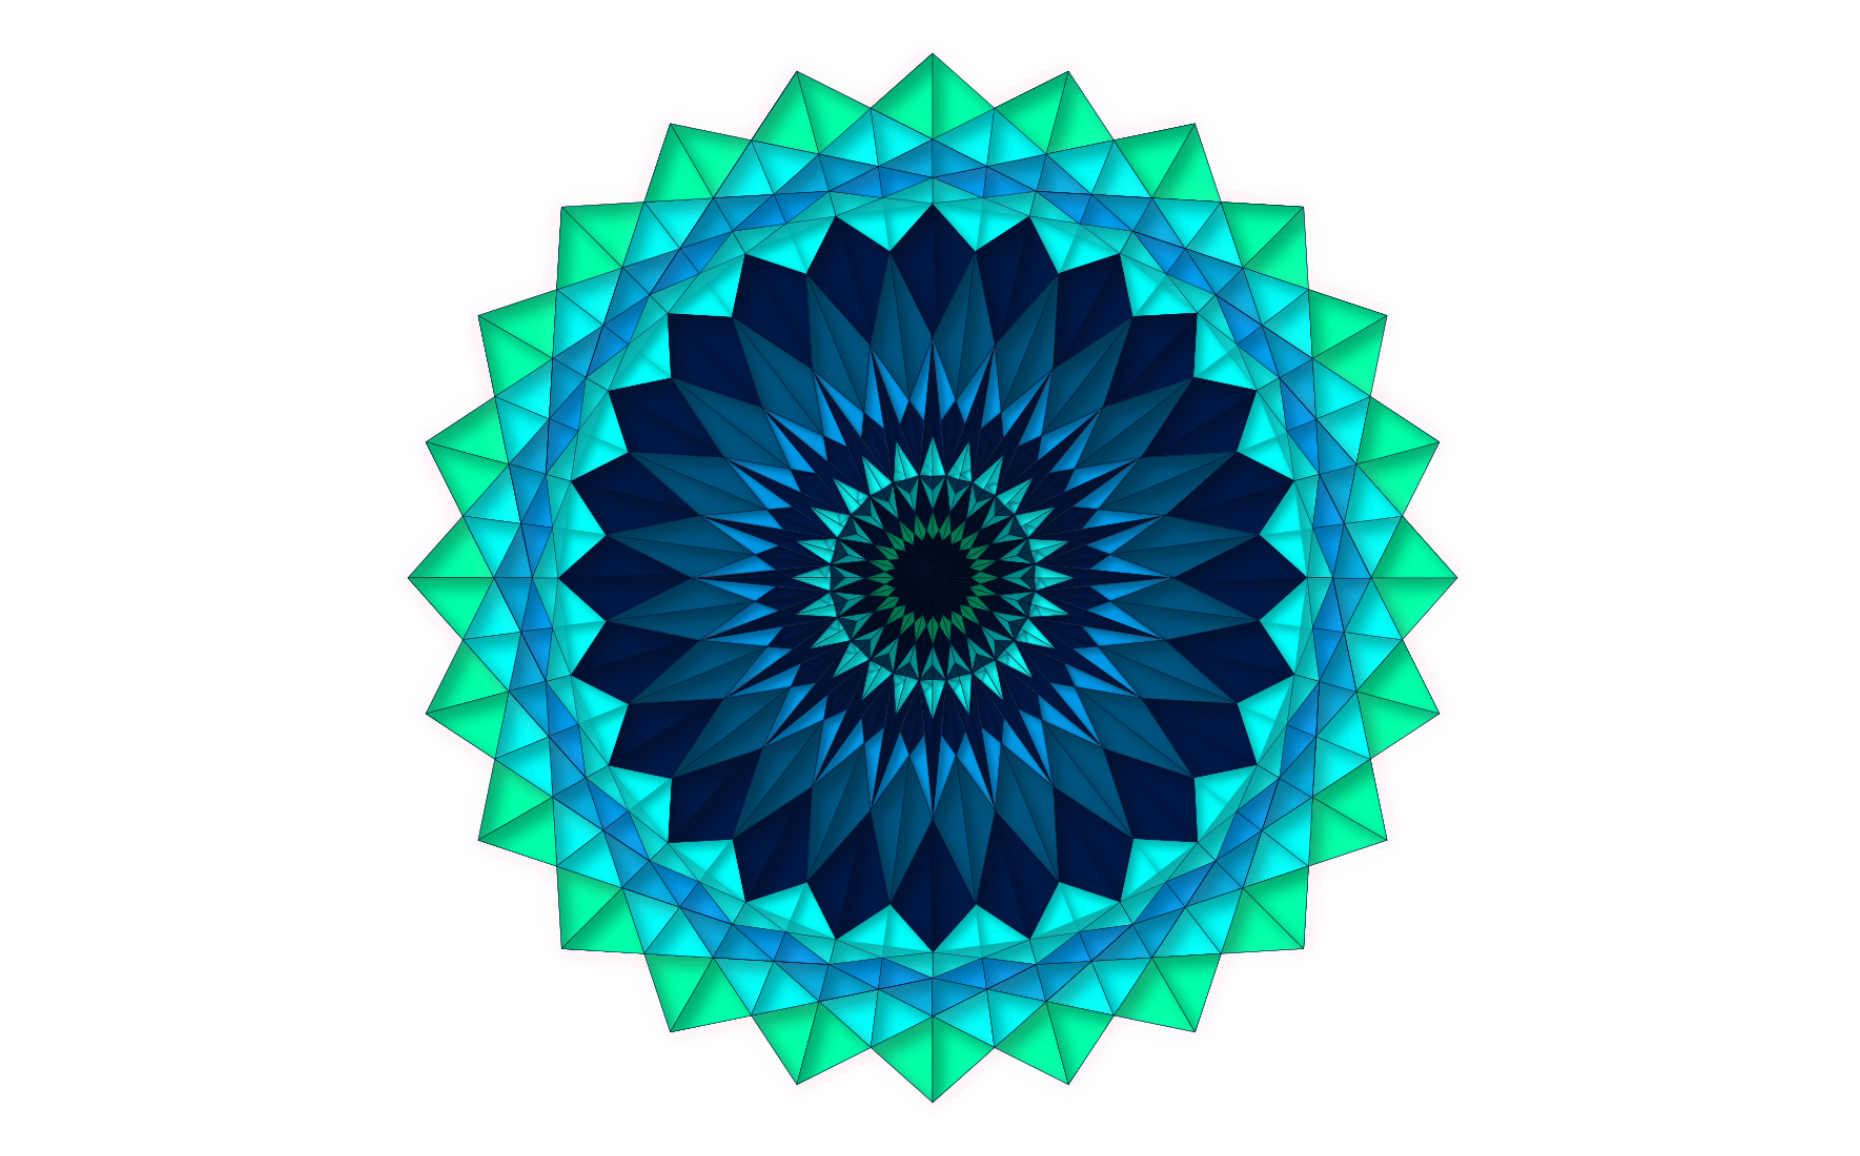 Vector art exploring   symmetry and color,Adobe Illustrator